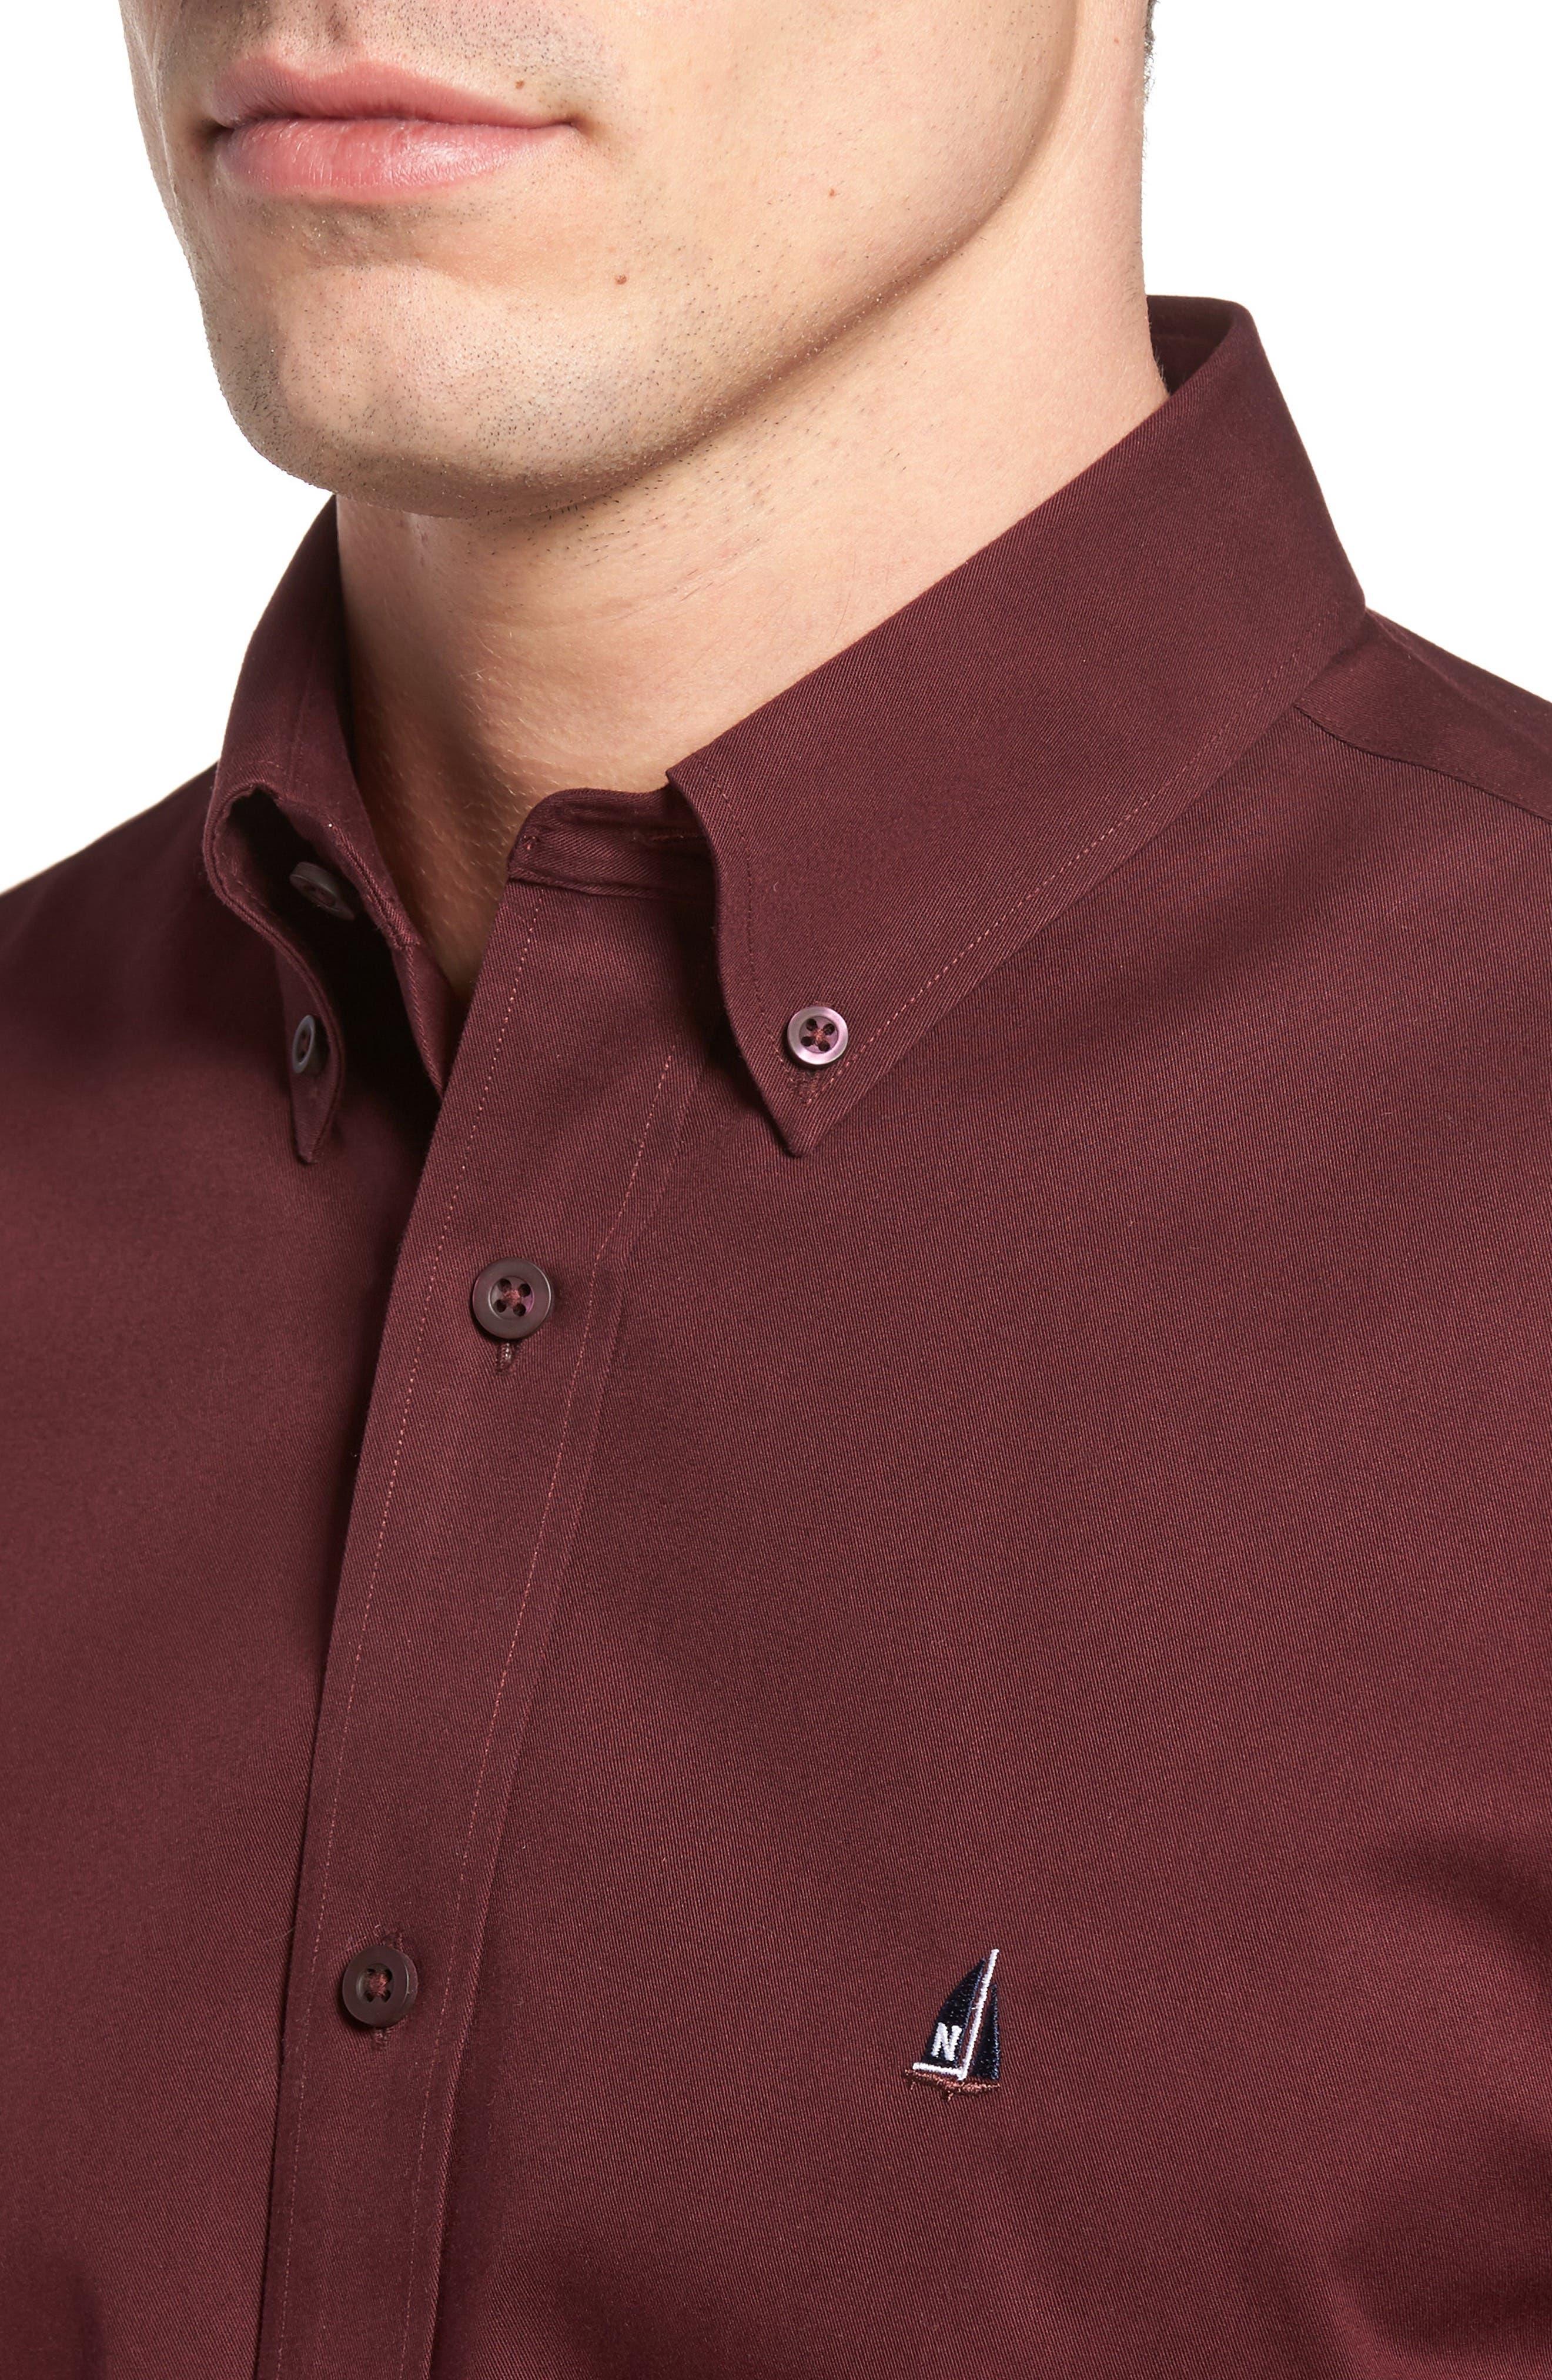 NORDSTROM MEN'S SHOP, Smartcare<sup>™</sup> Traditional Fit Twill Boat Shirt, Alternate thumbnail 4, color, BURGUNDY ROYALE